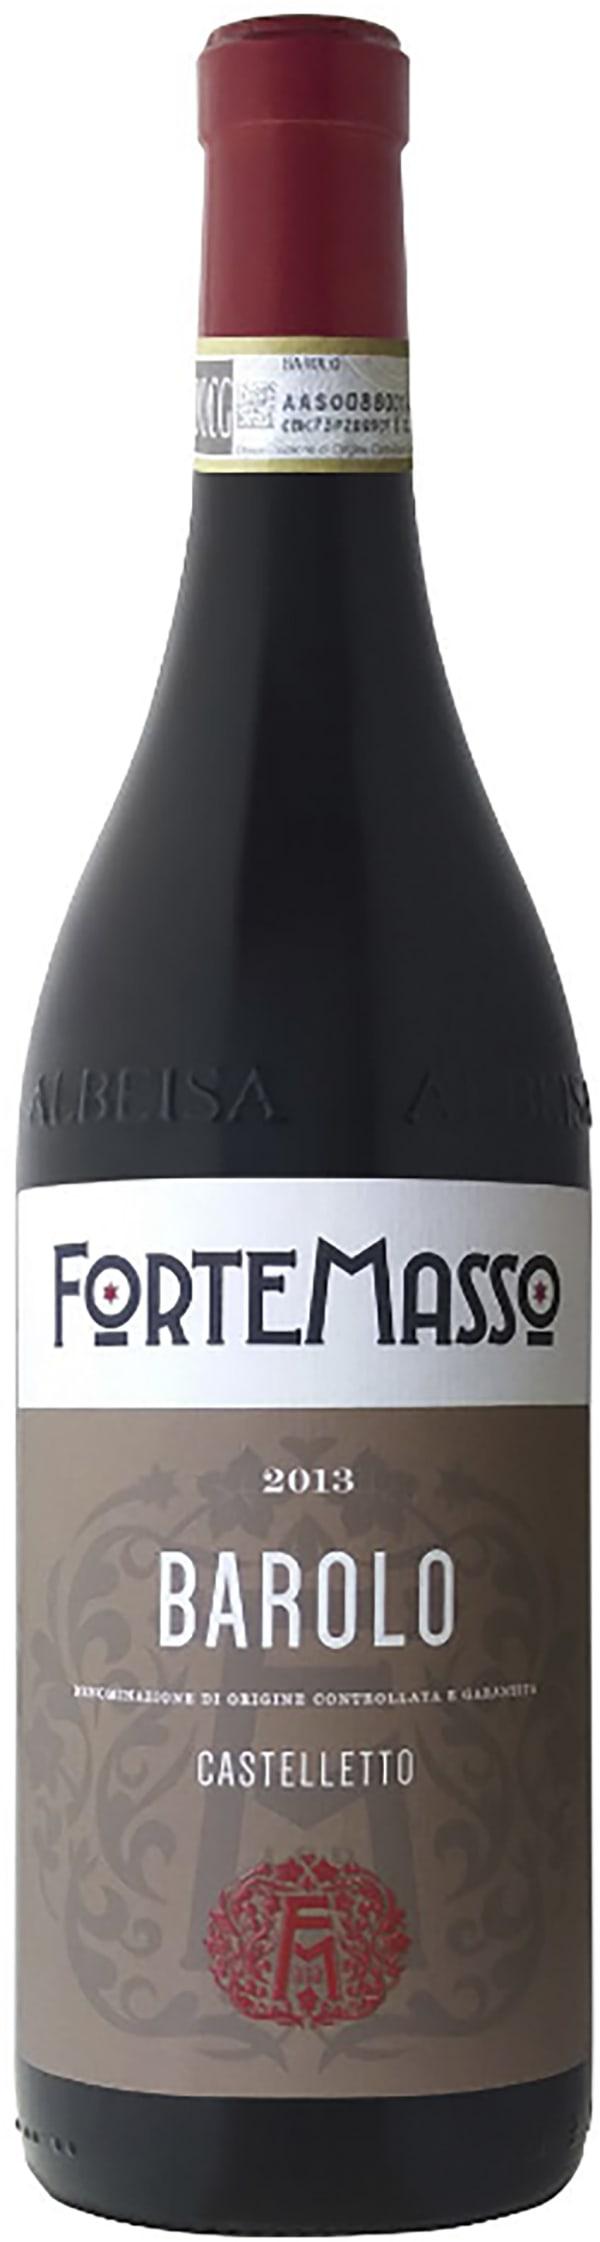 Fortemasso Barolo Castelletto 2015